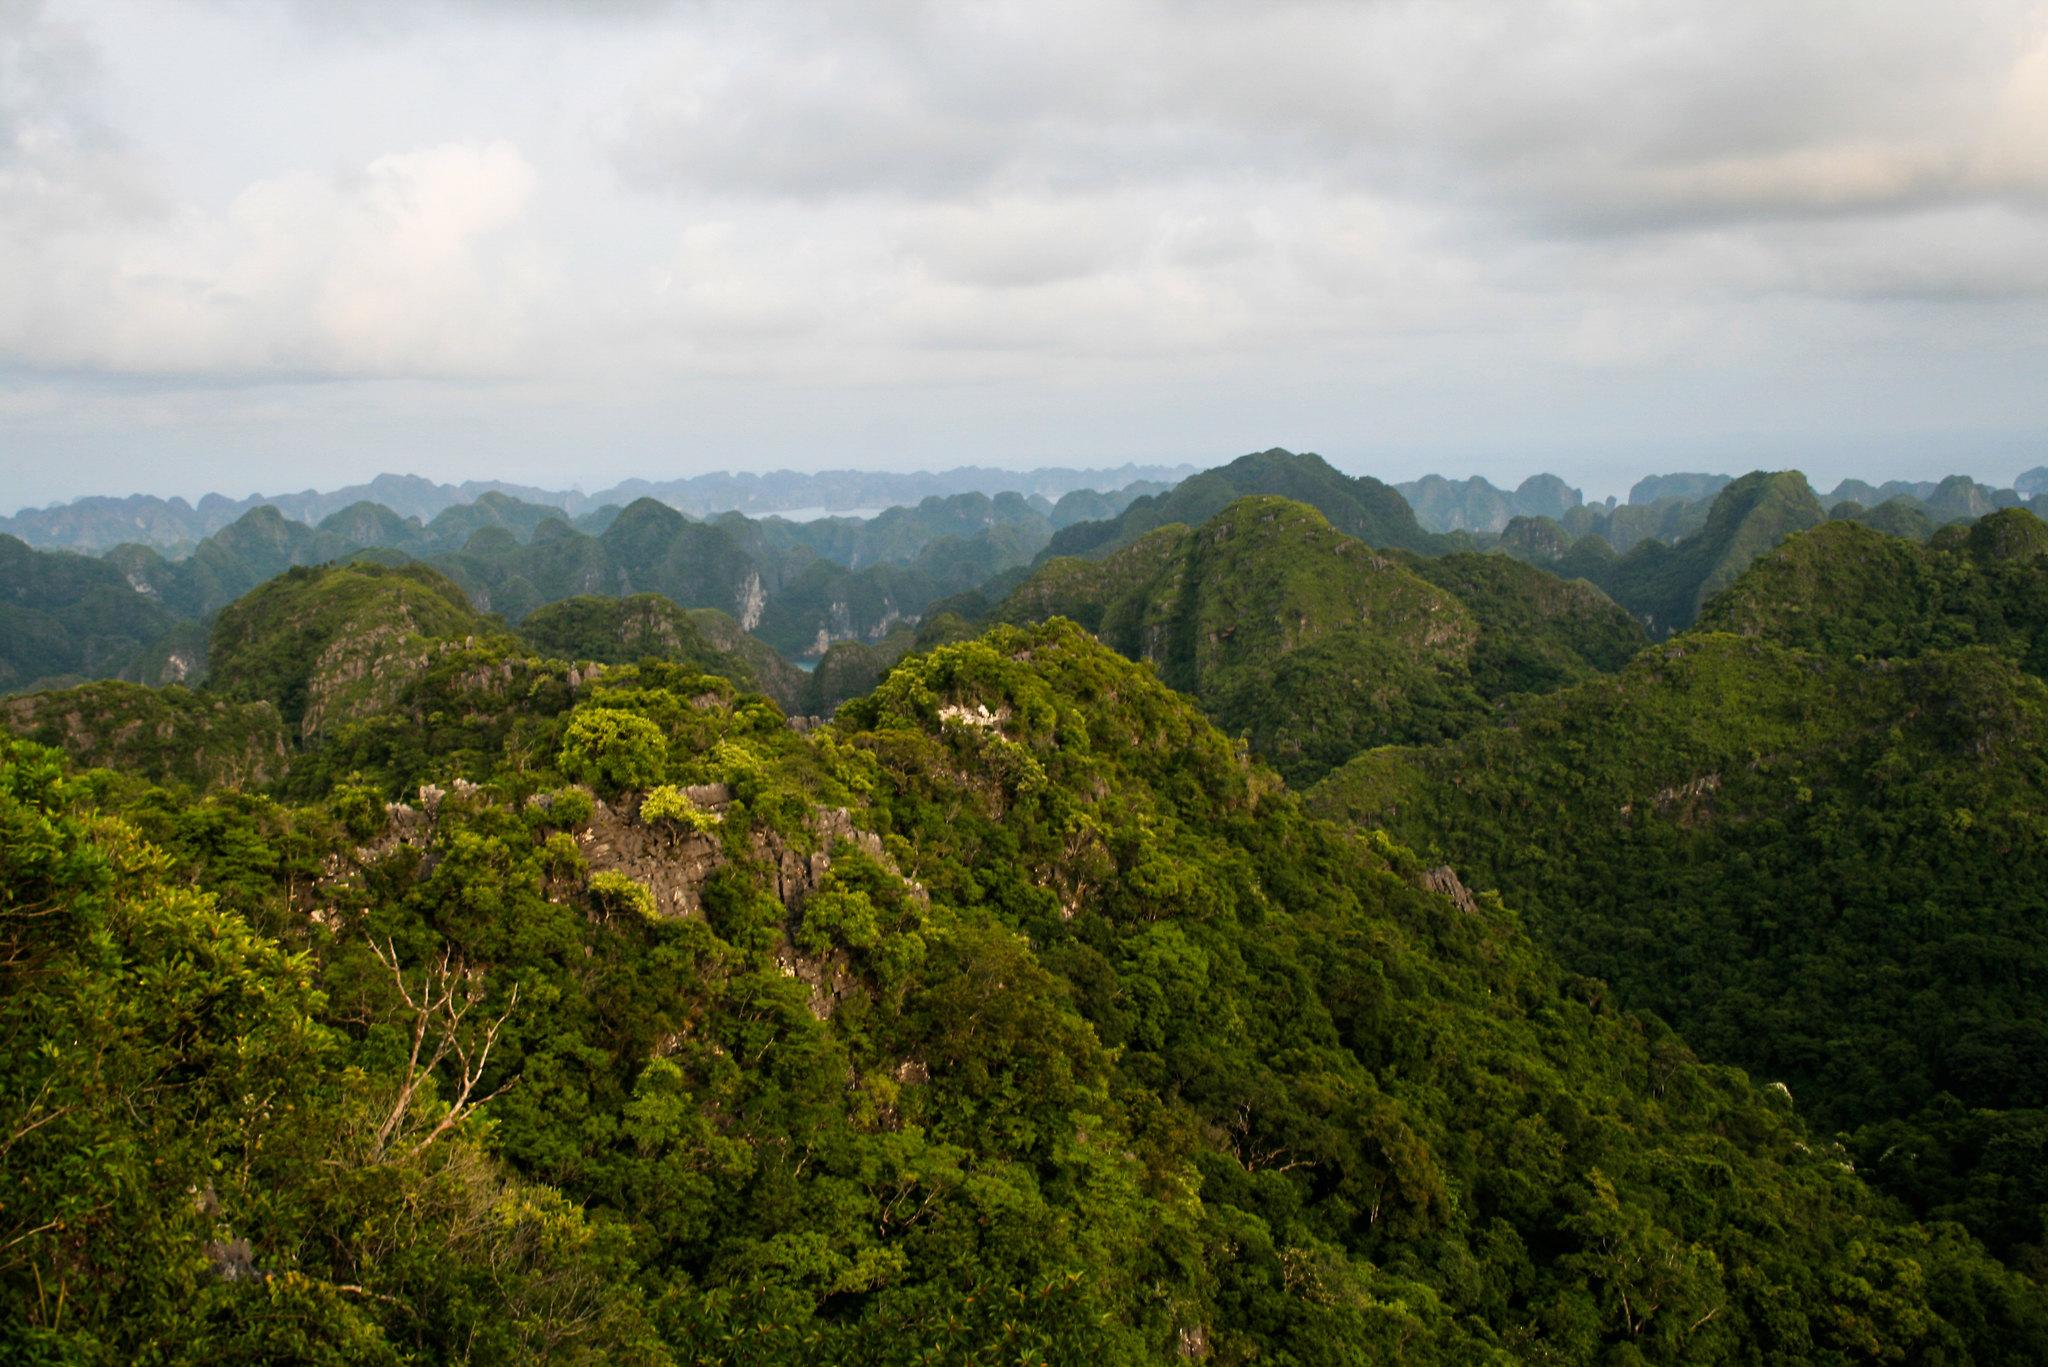 forest-landscape-vietnam-terry-sunderland-CIFOR